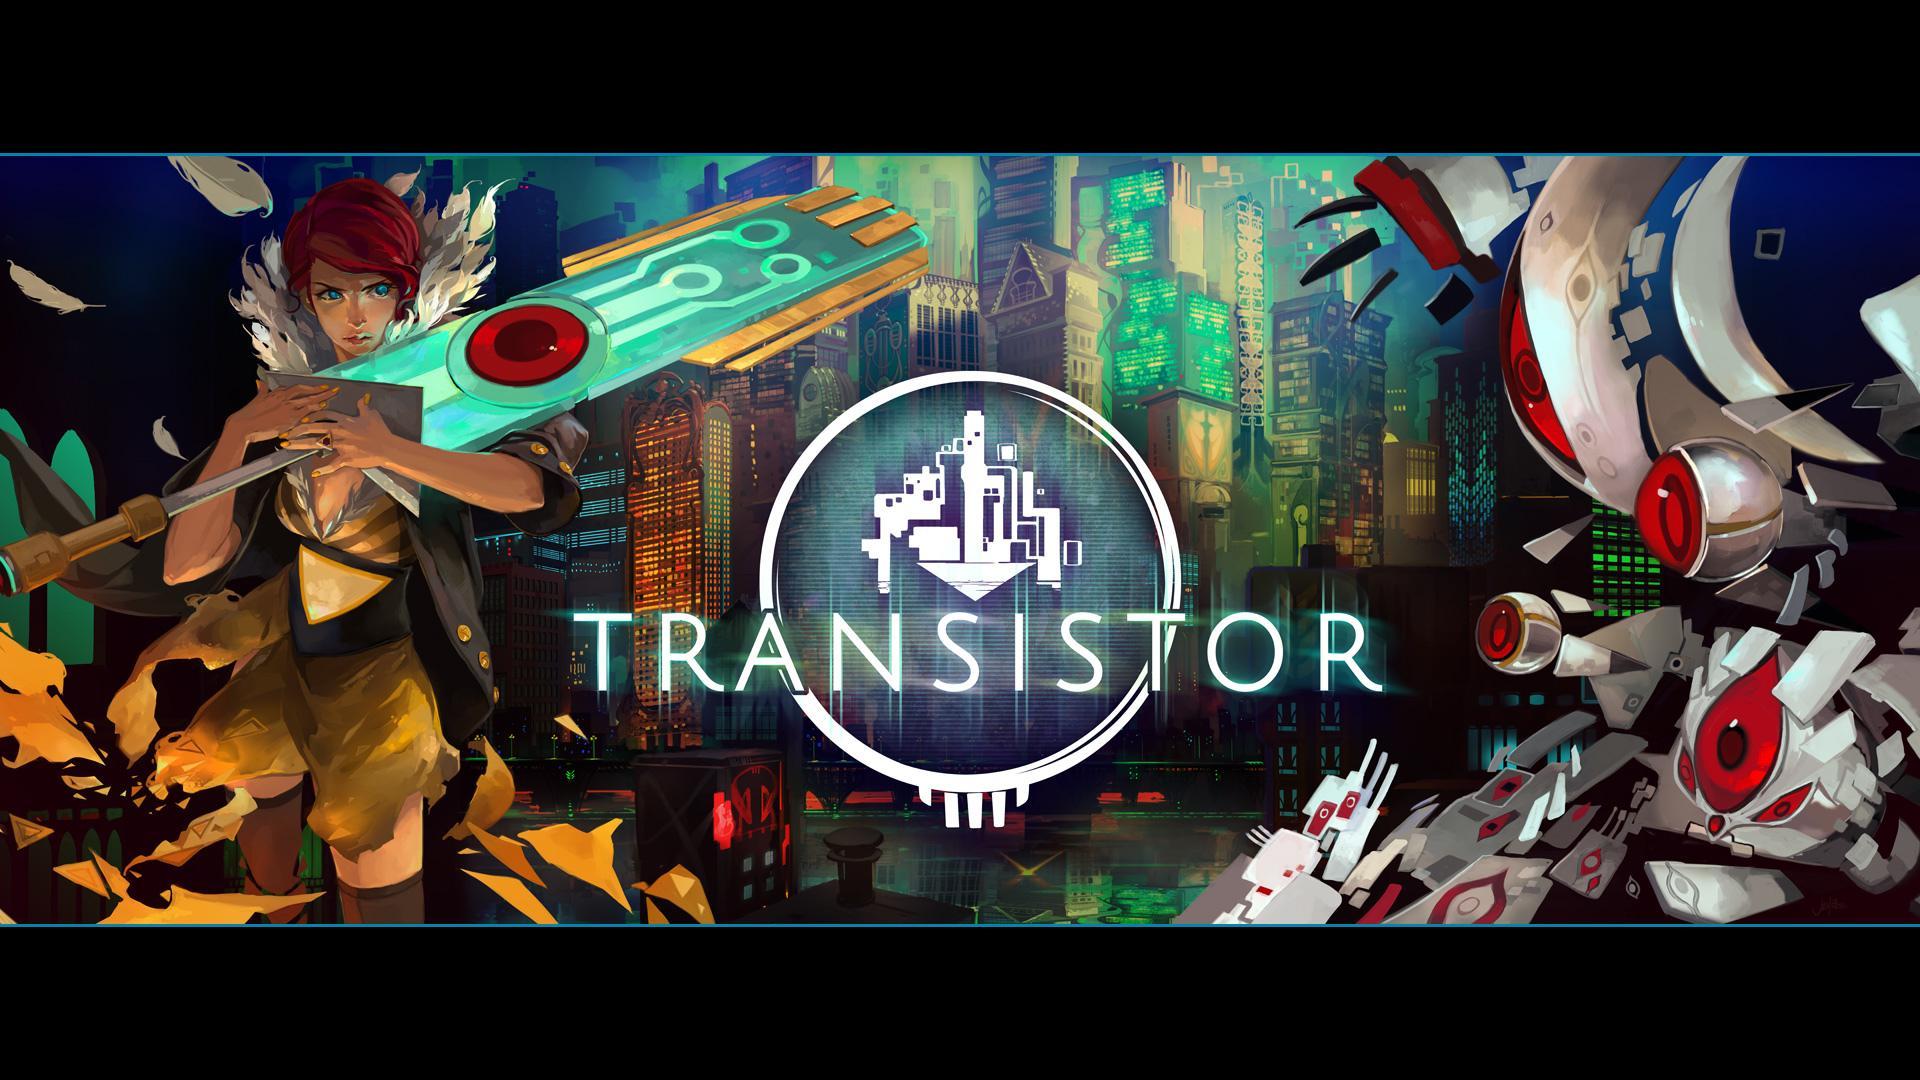 transistor wallpaper hd download